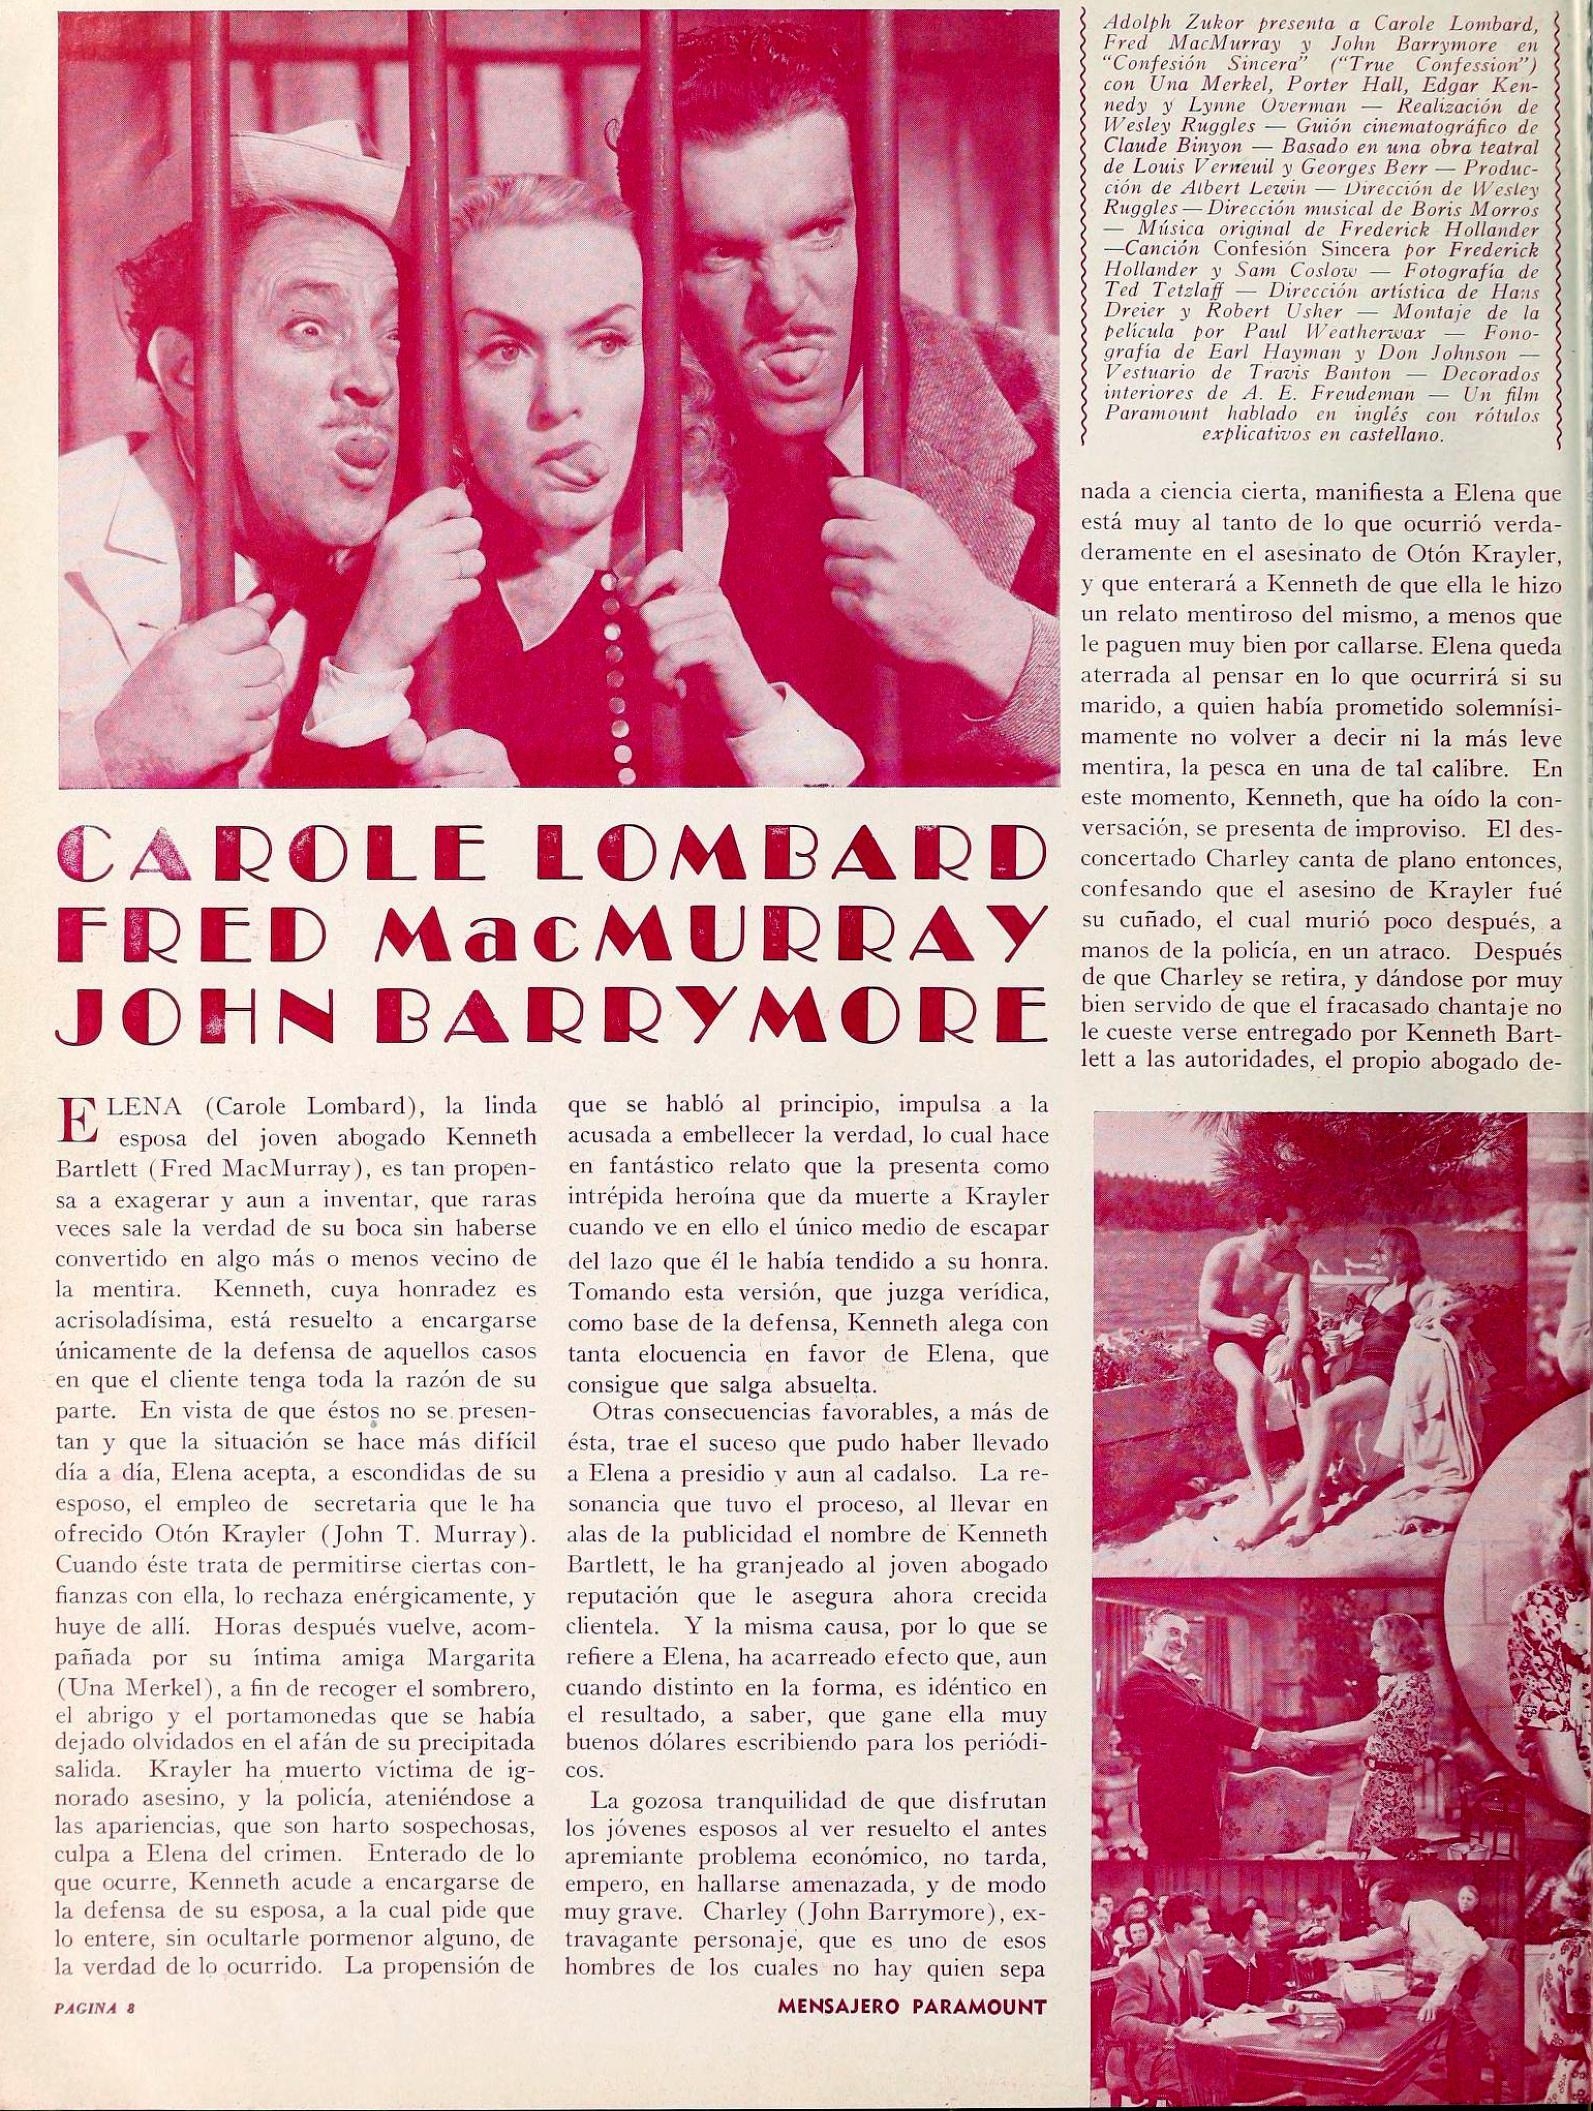 carole lombard true confession mensajero paramount jan 1938aa